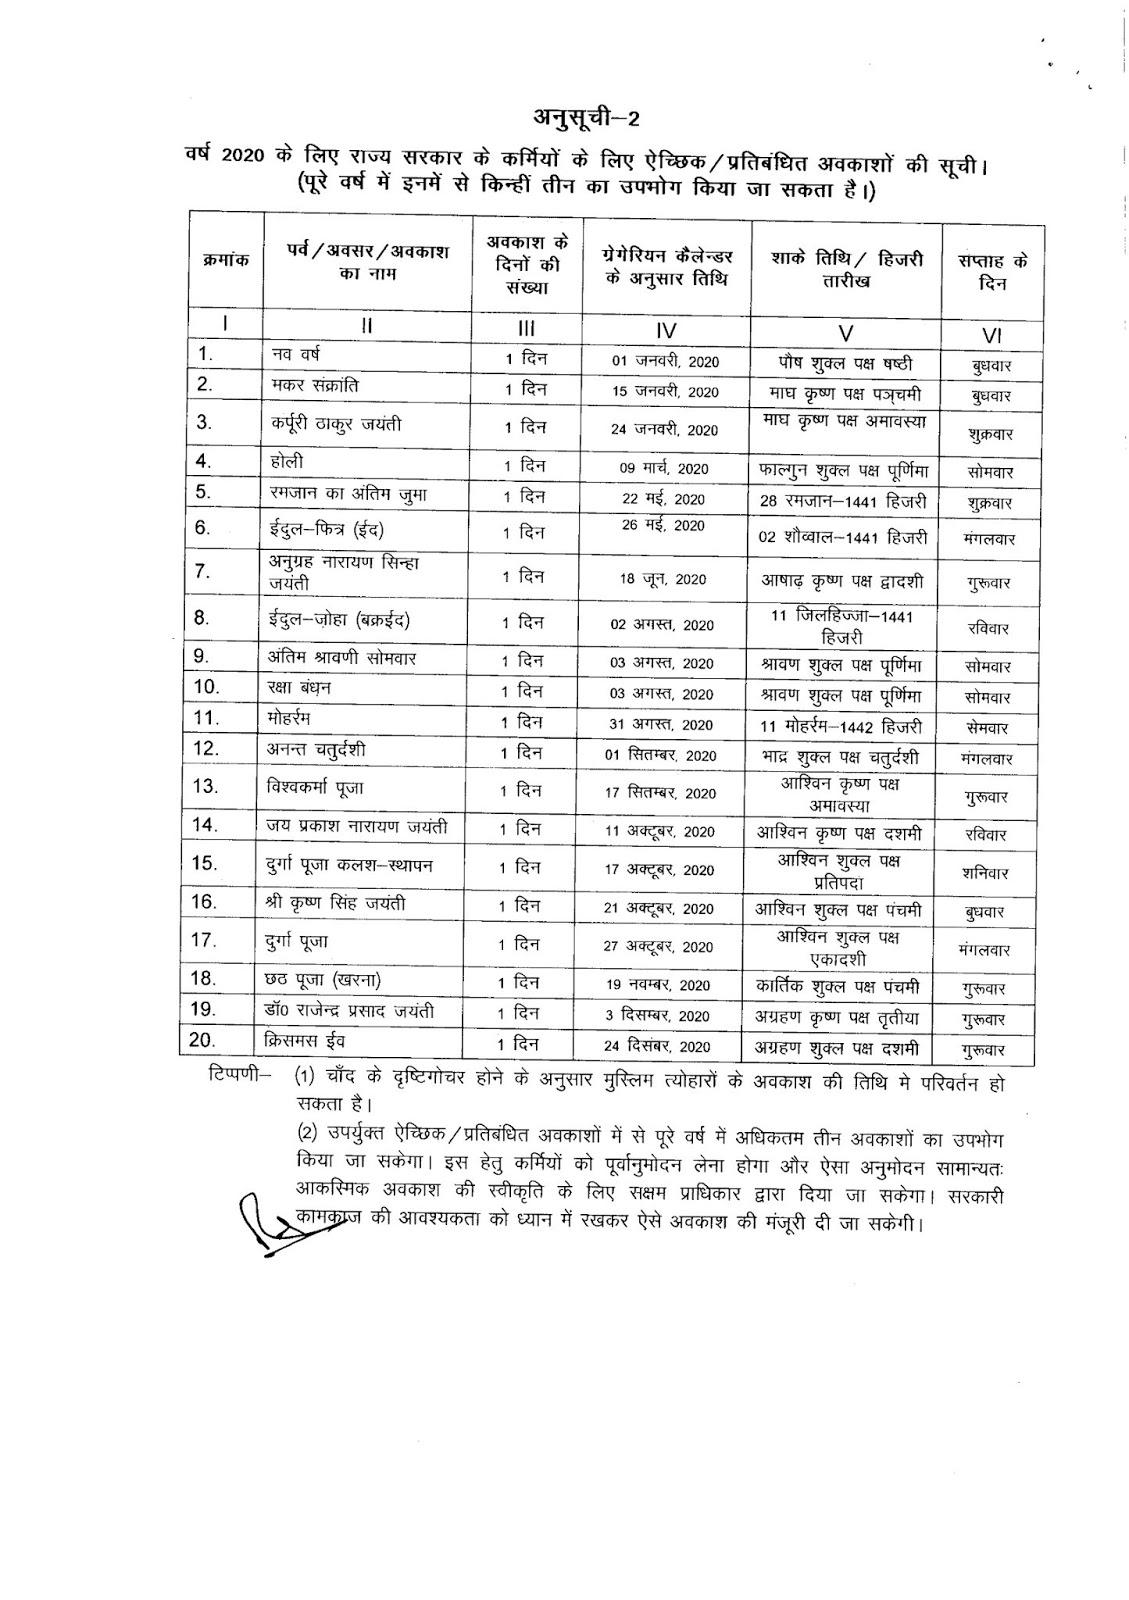 Bihar Government Calendar 2020 #educratsweb pertaining to Bihar Government Calender 2020